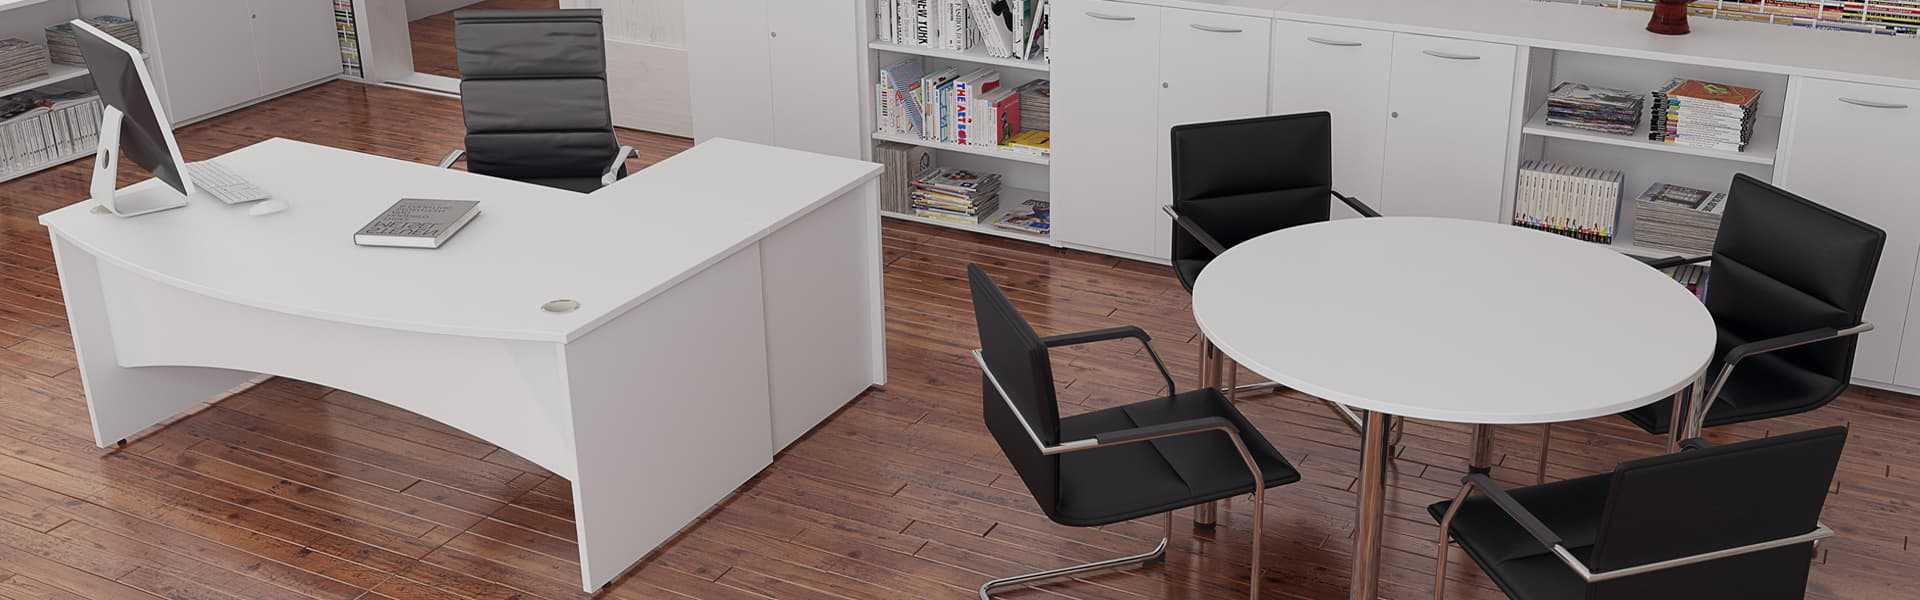 Rapid Office Furniture Birmingham Delivery